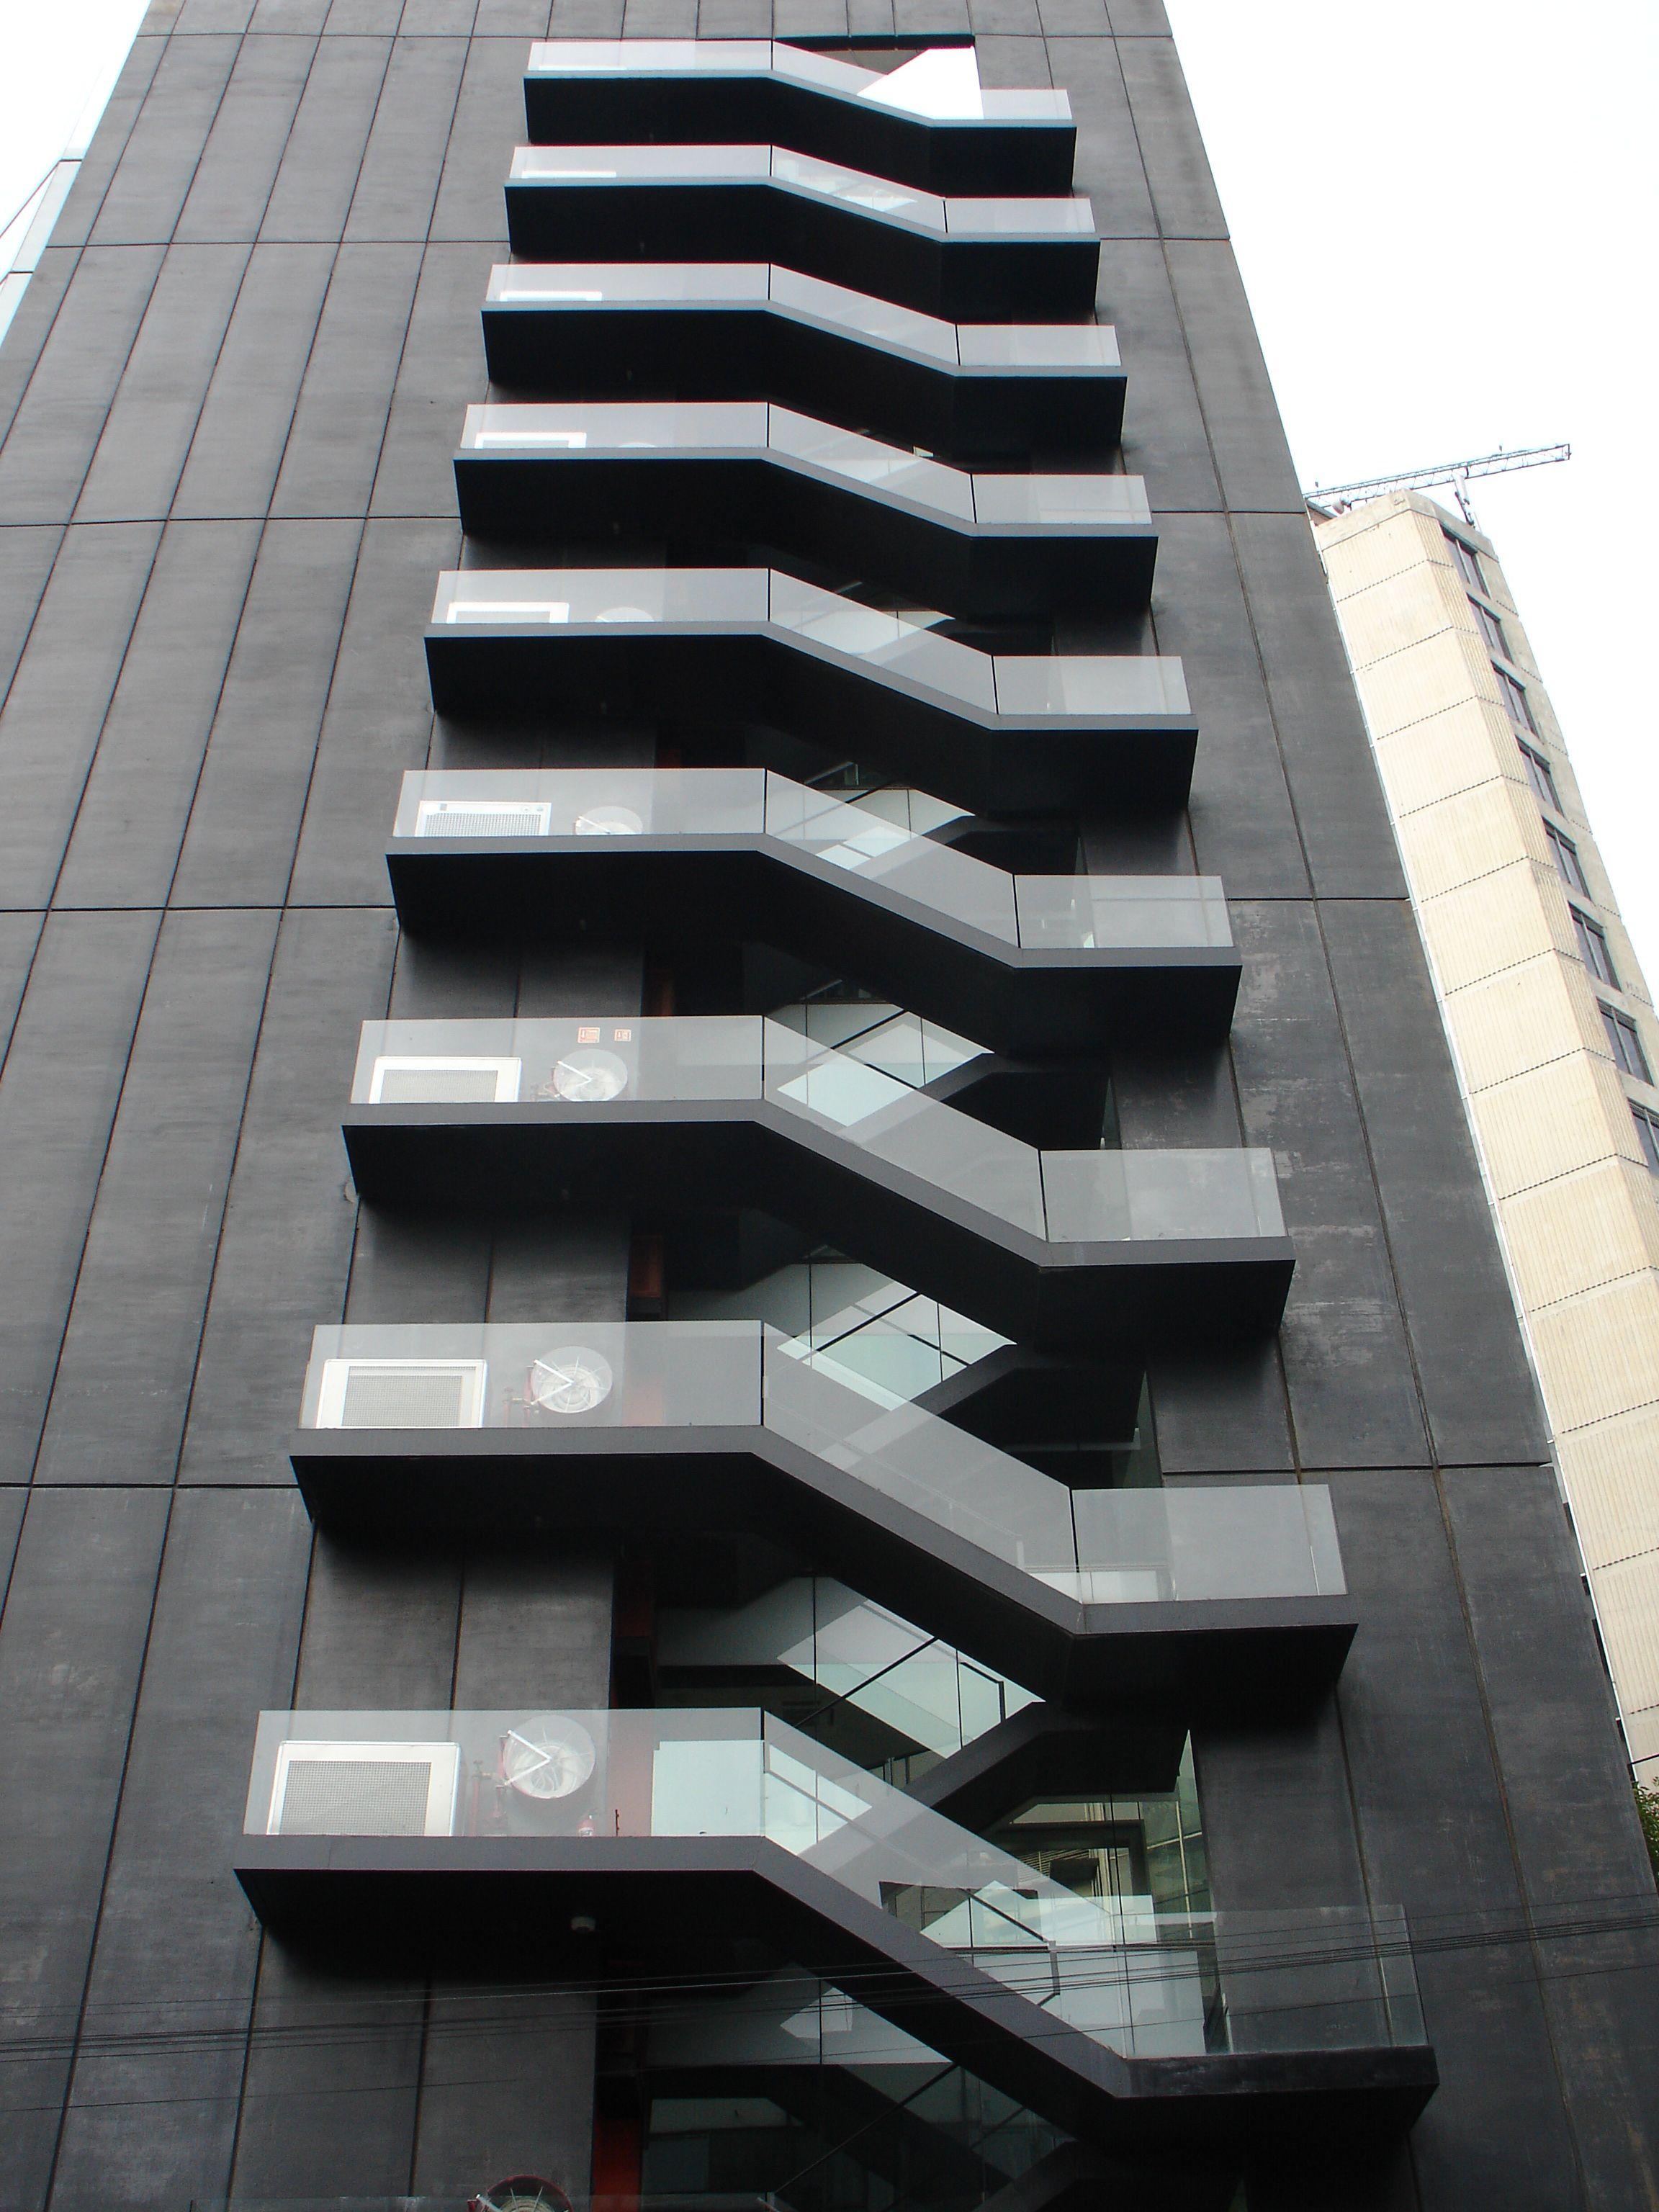 Arquitectura Casas Escaleras Exteriores Arquitectura: Escaleras De Emergencia. Torre Tres Picos. LBR & A Arquitectos